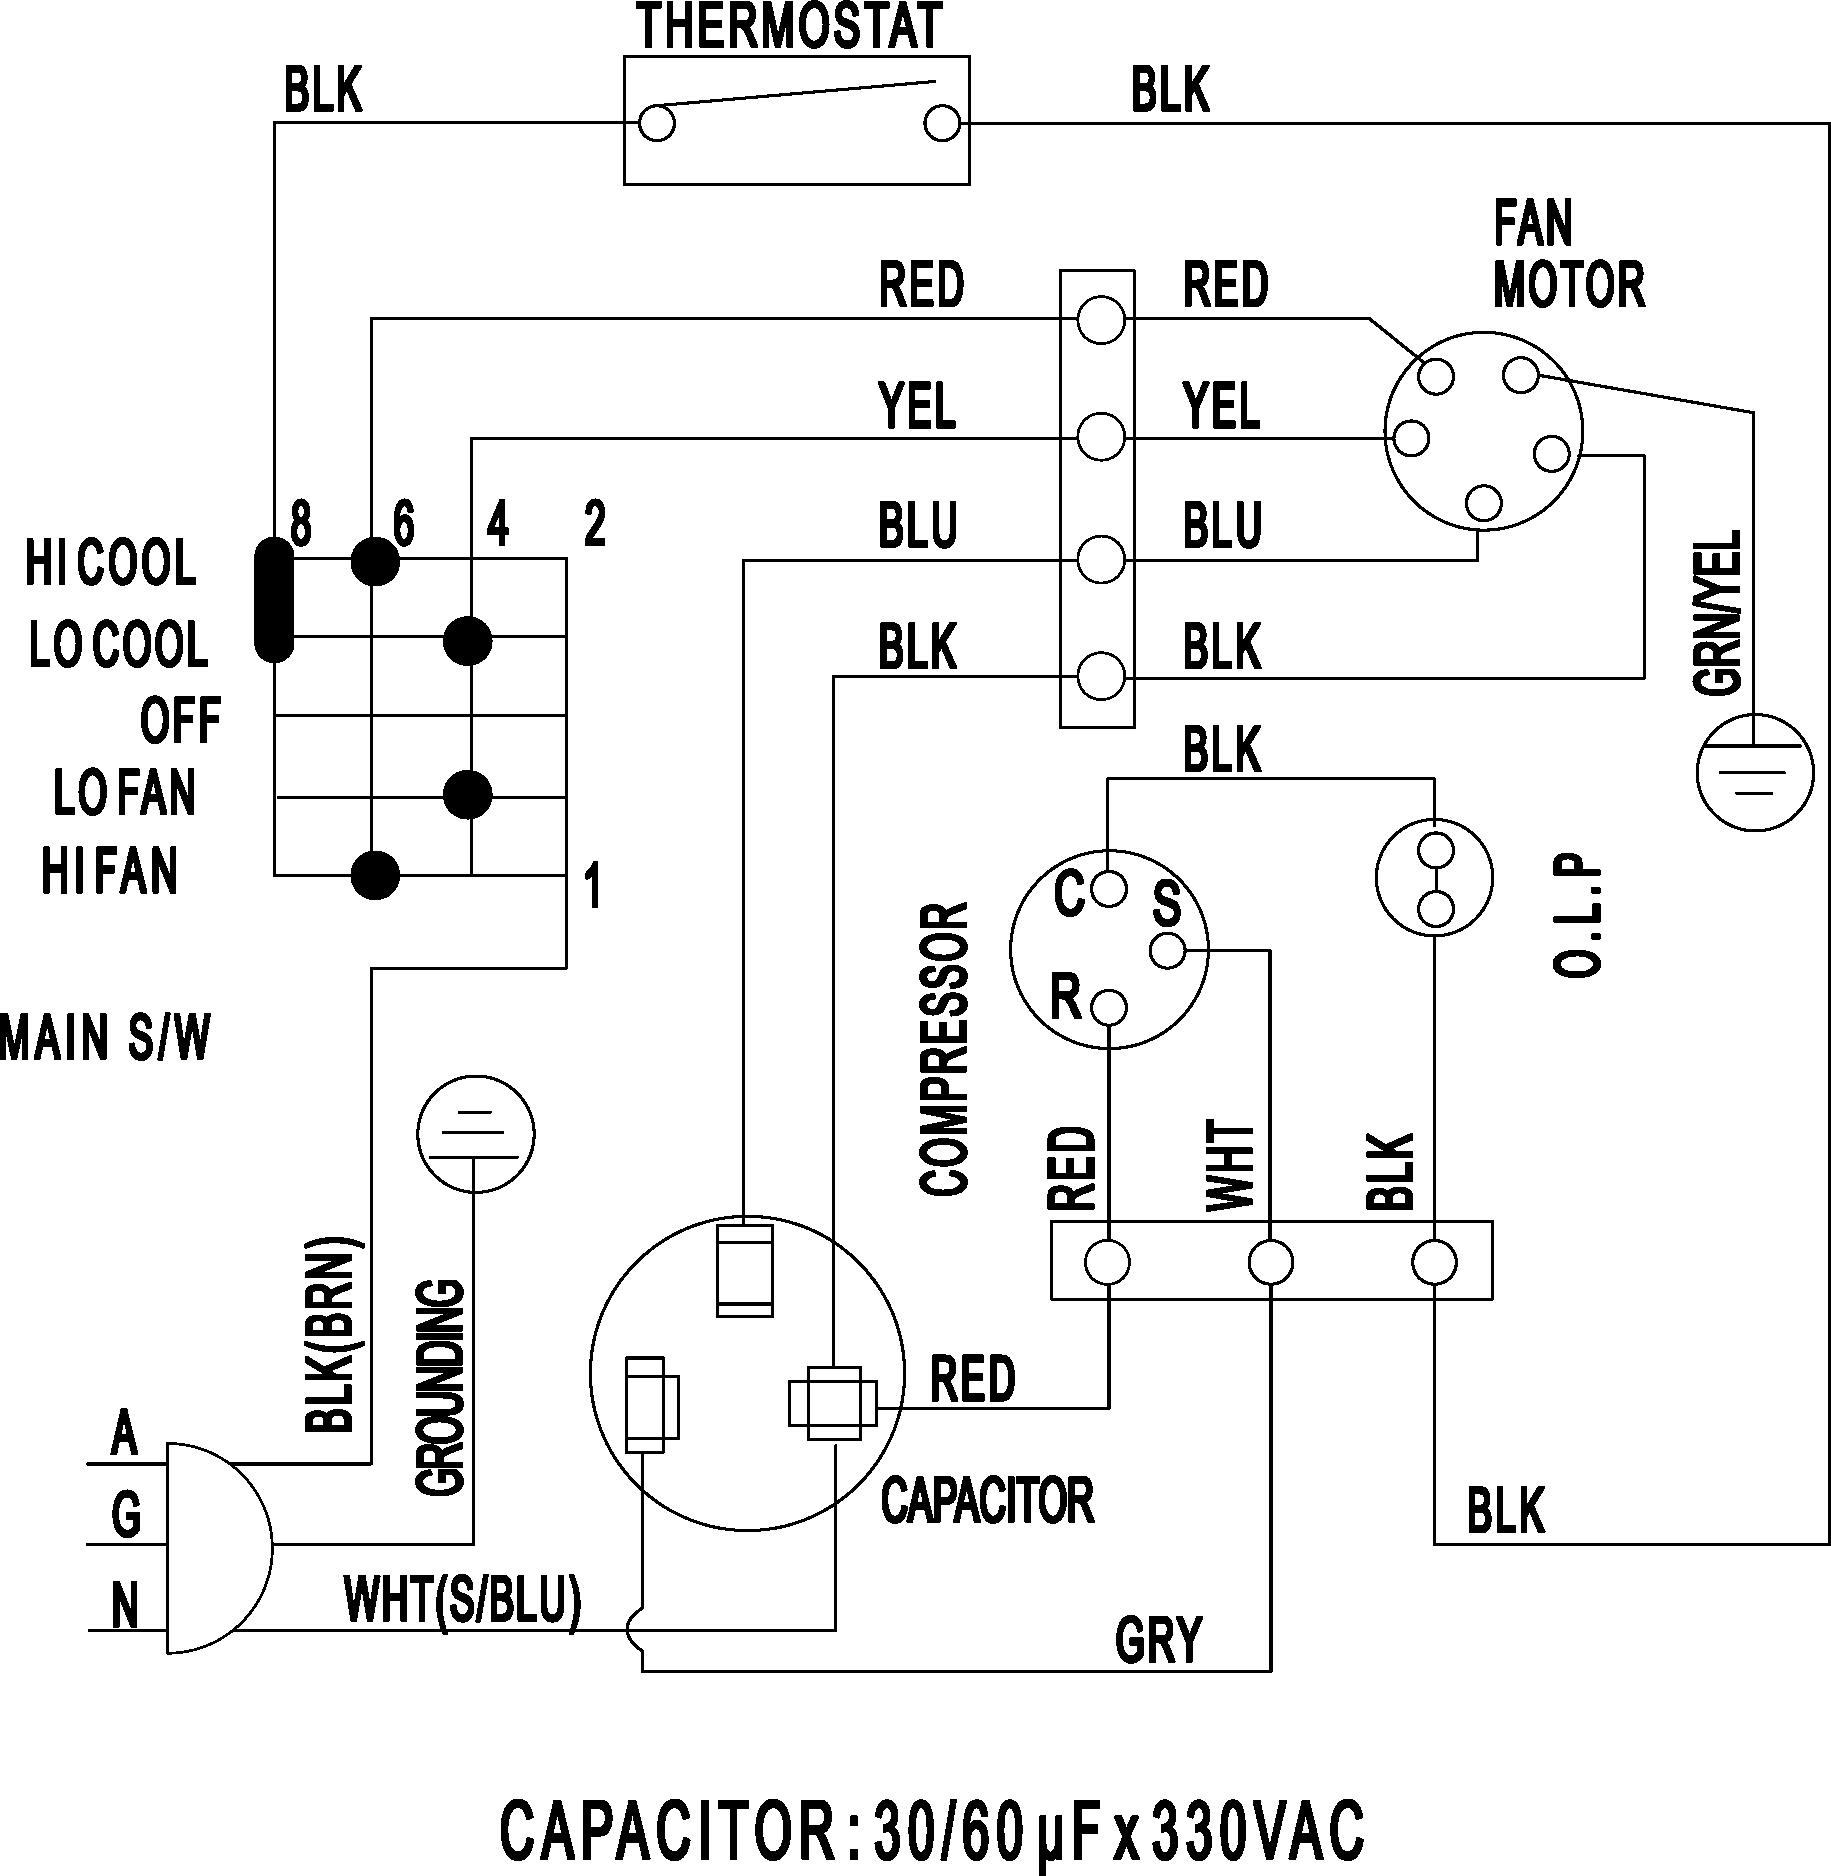 DW_4479] Wiring Information Diagram And Parts List For Samsung Roomair Free  DiagramBenkeme Gentot Mohammedshrine Librar Wiring 101